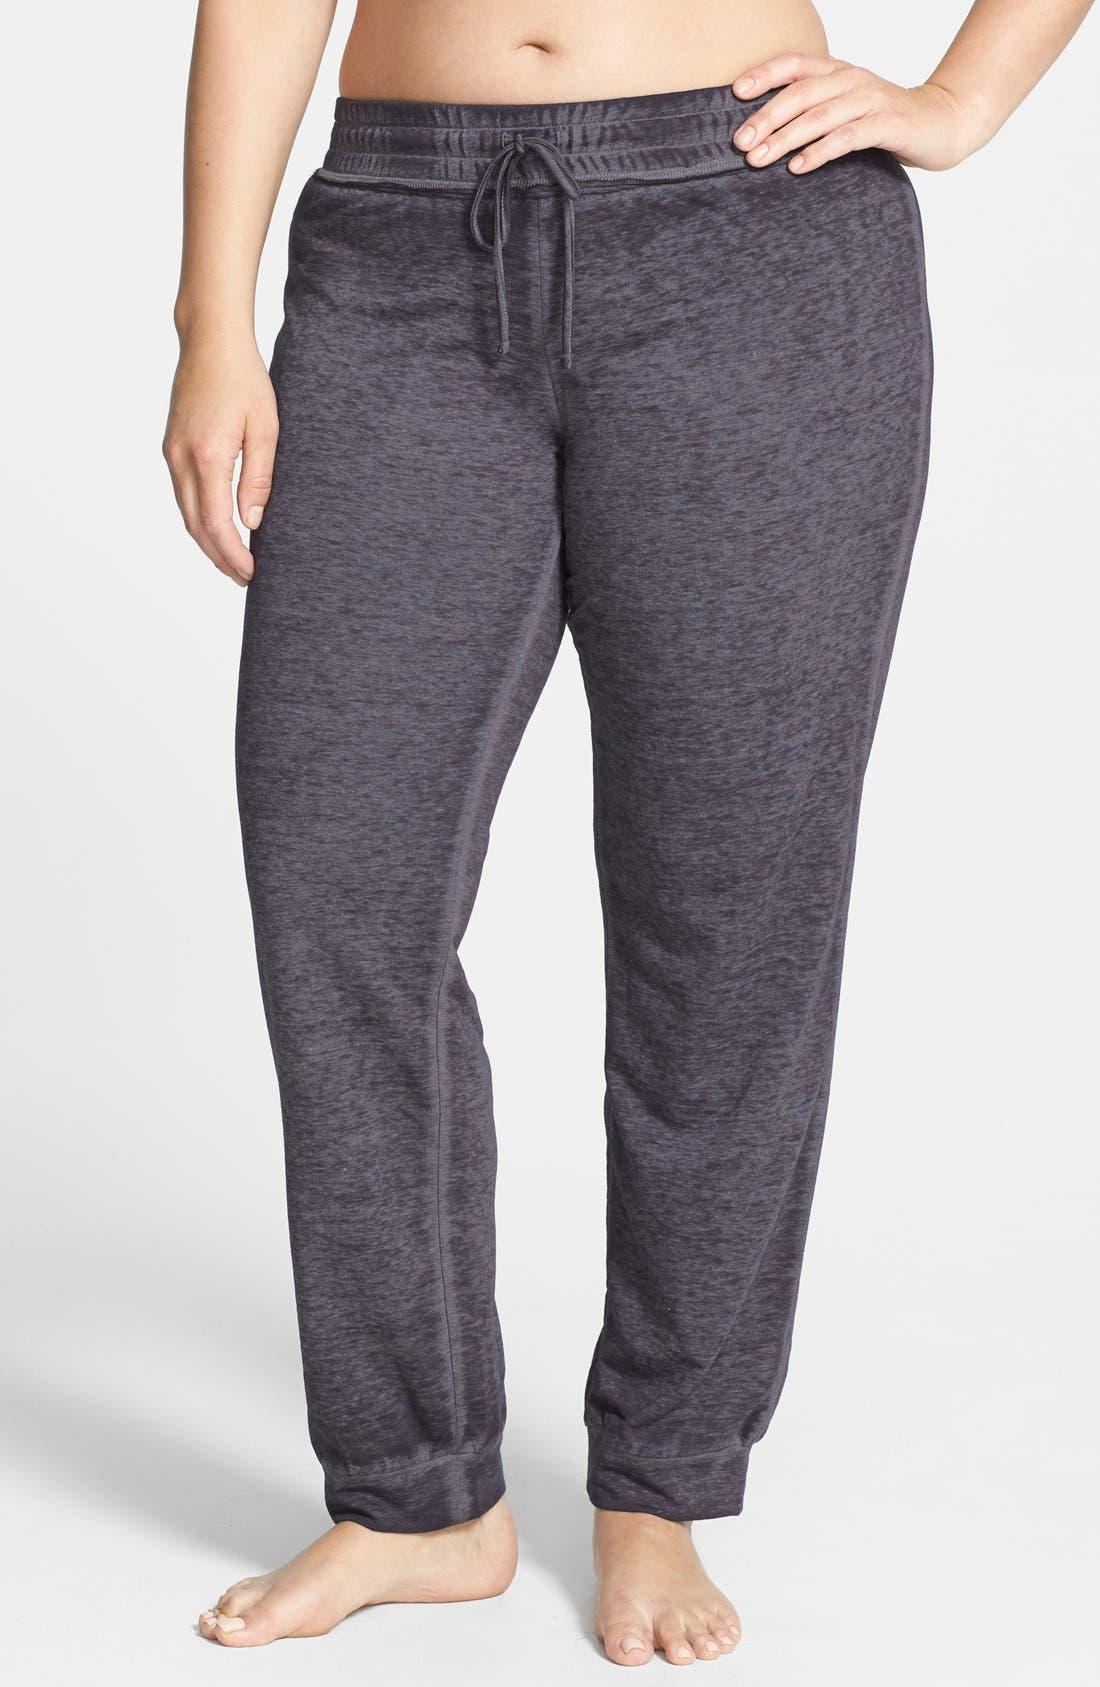 Main Image - Make + Model 'Paige' Skinny Sweatpants (Plus Size)